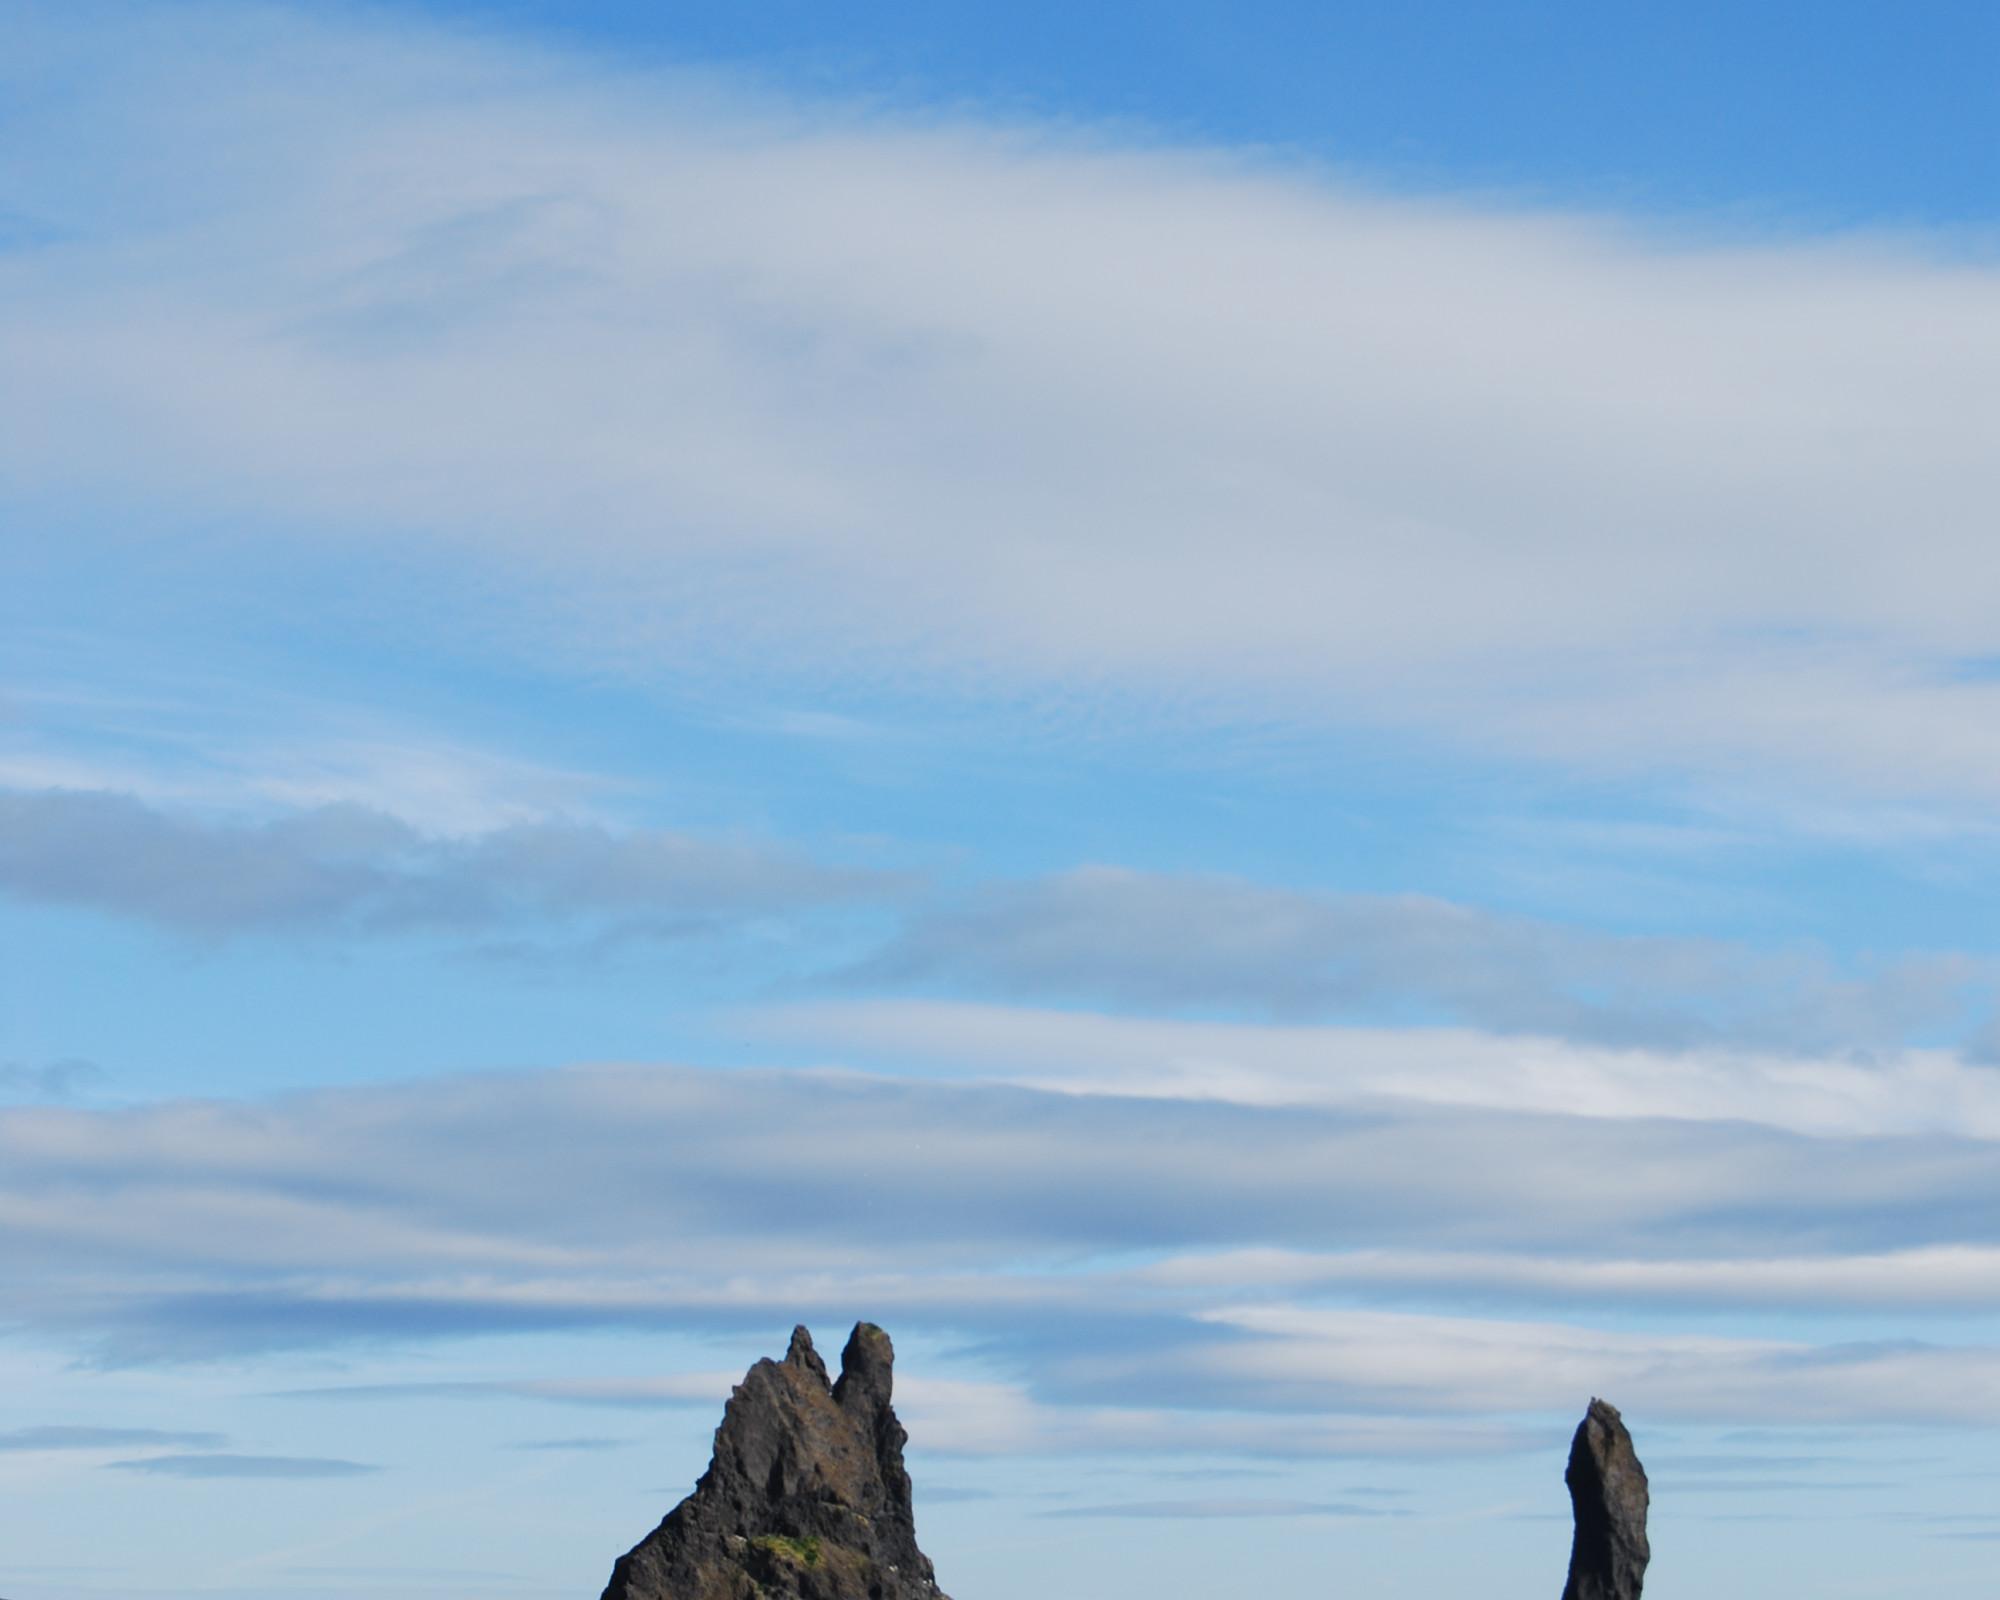 Photo 3: Reynisdrangar, au bord de l'océan